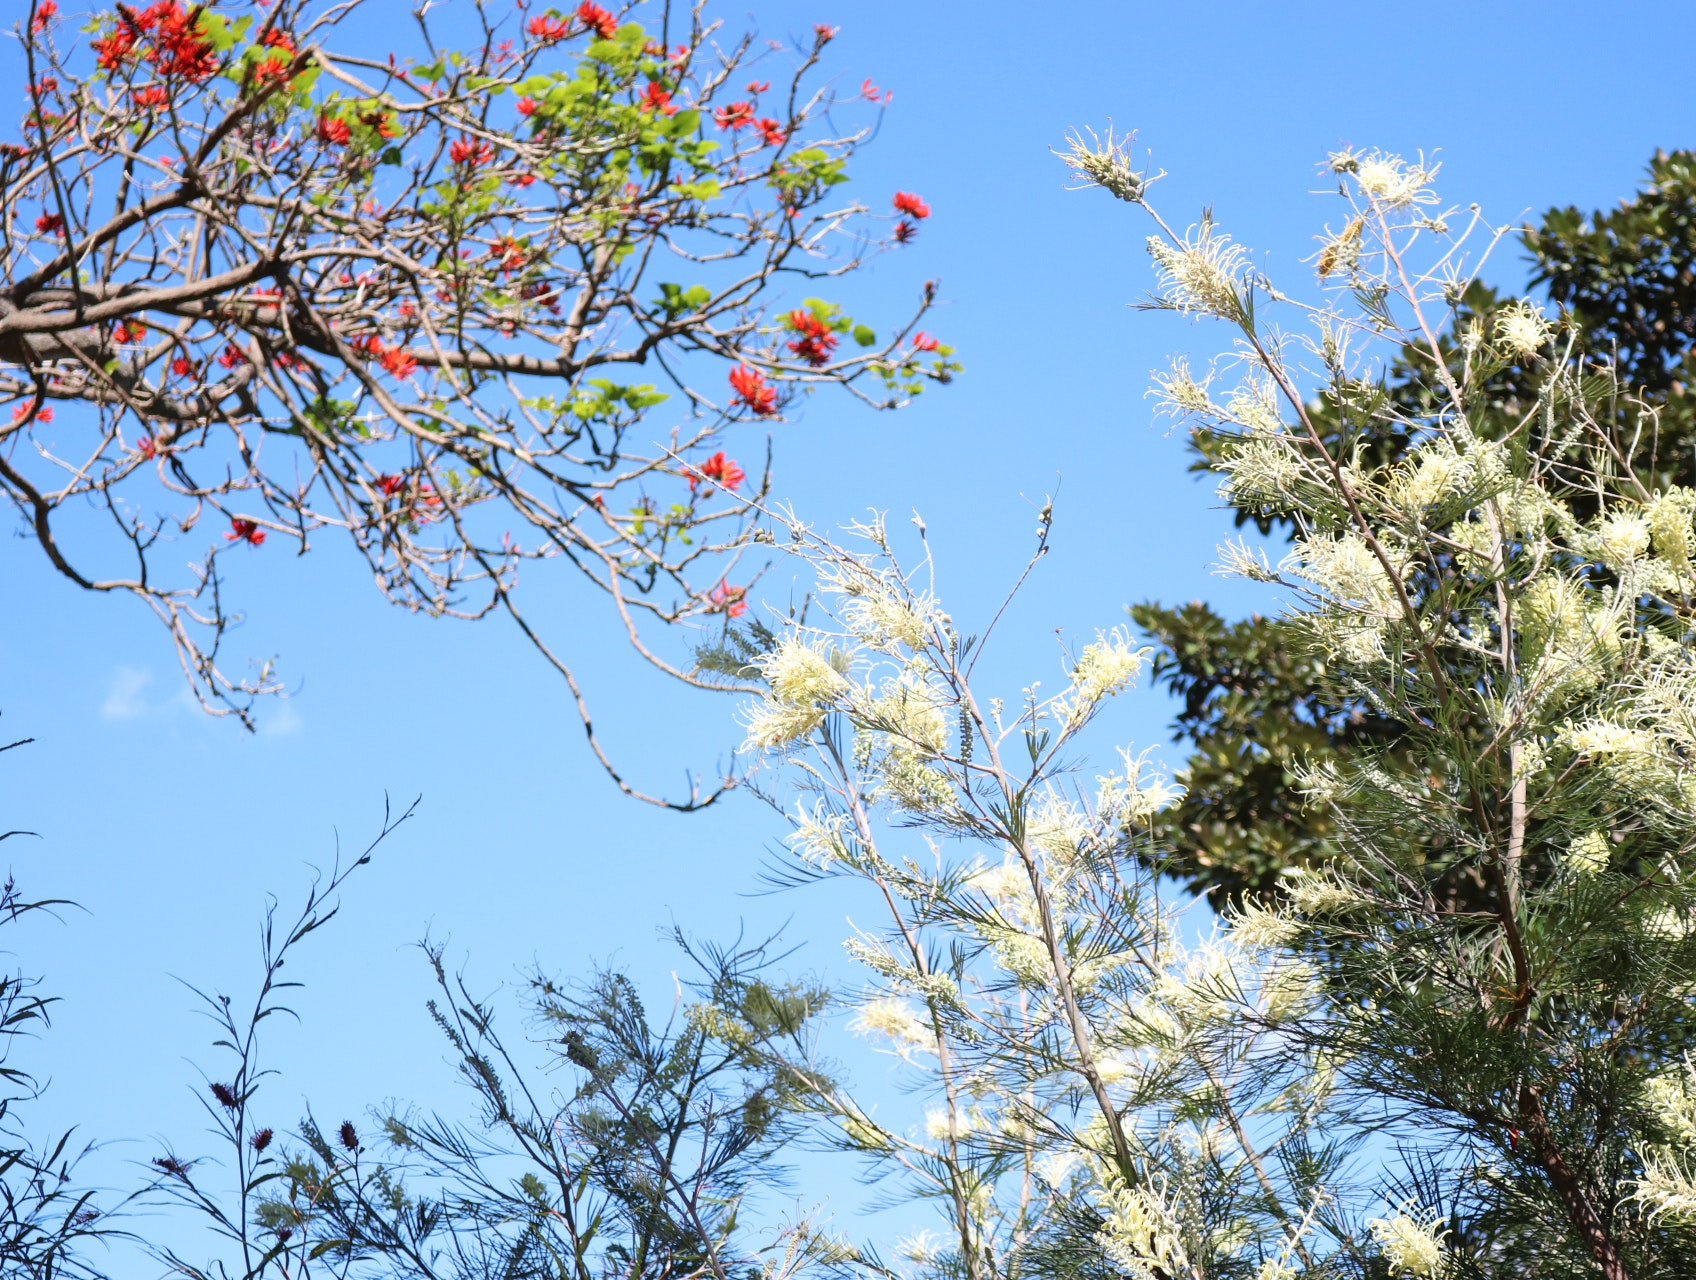 Free stock photo of beautiful flowers trees free download izmirmasajfo